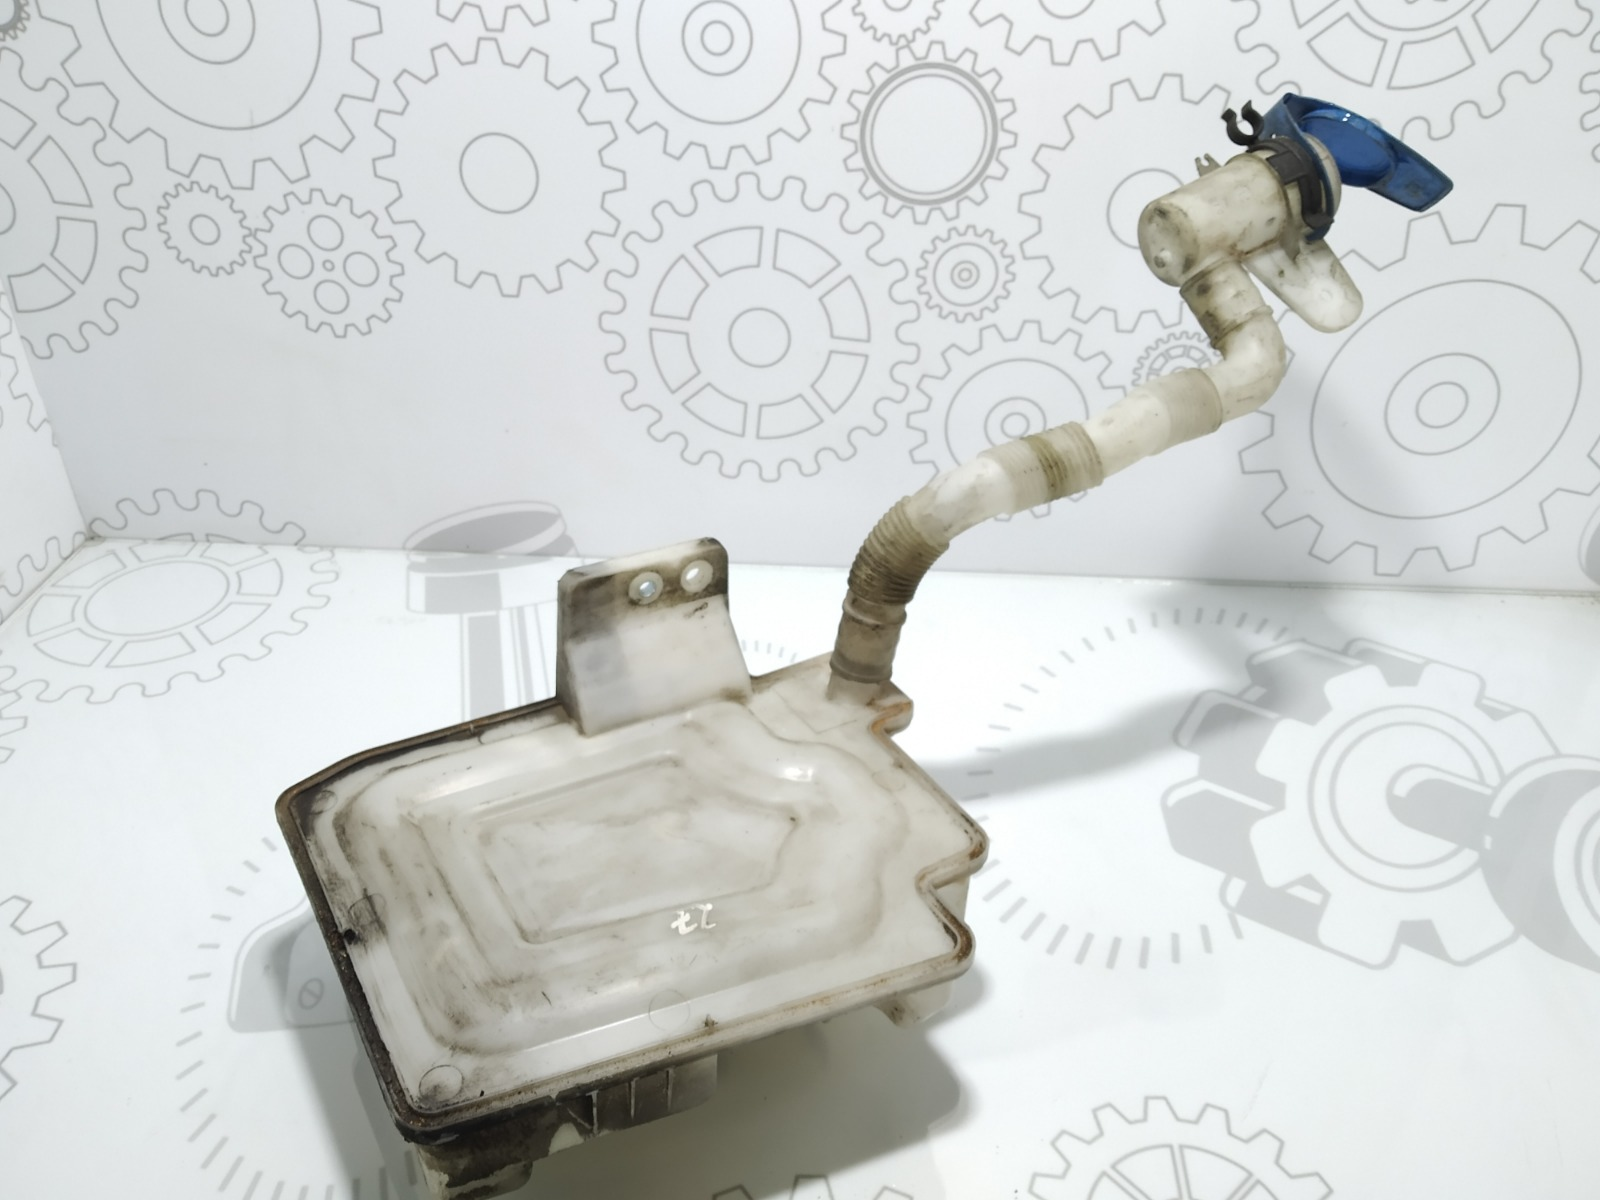 Бачок омывателя Volkswagen Touran 1.6 FSI 2003 (б/у)